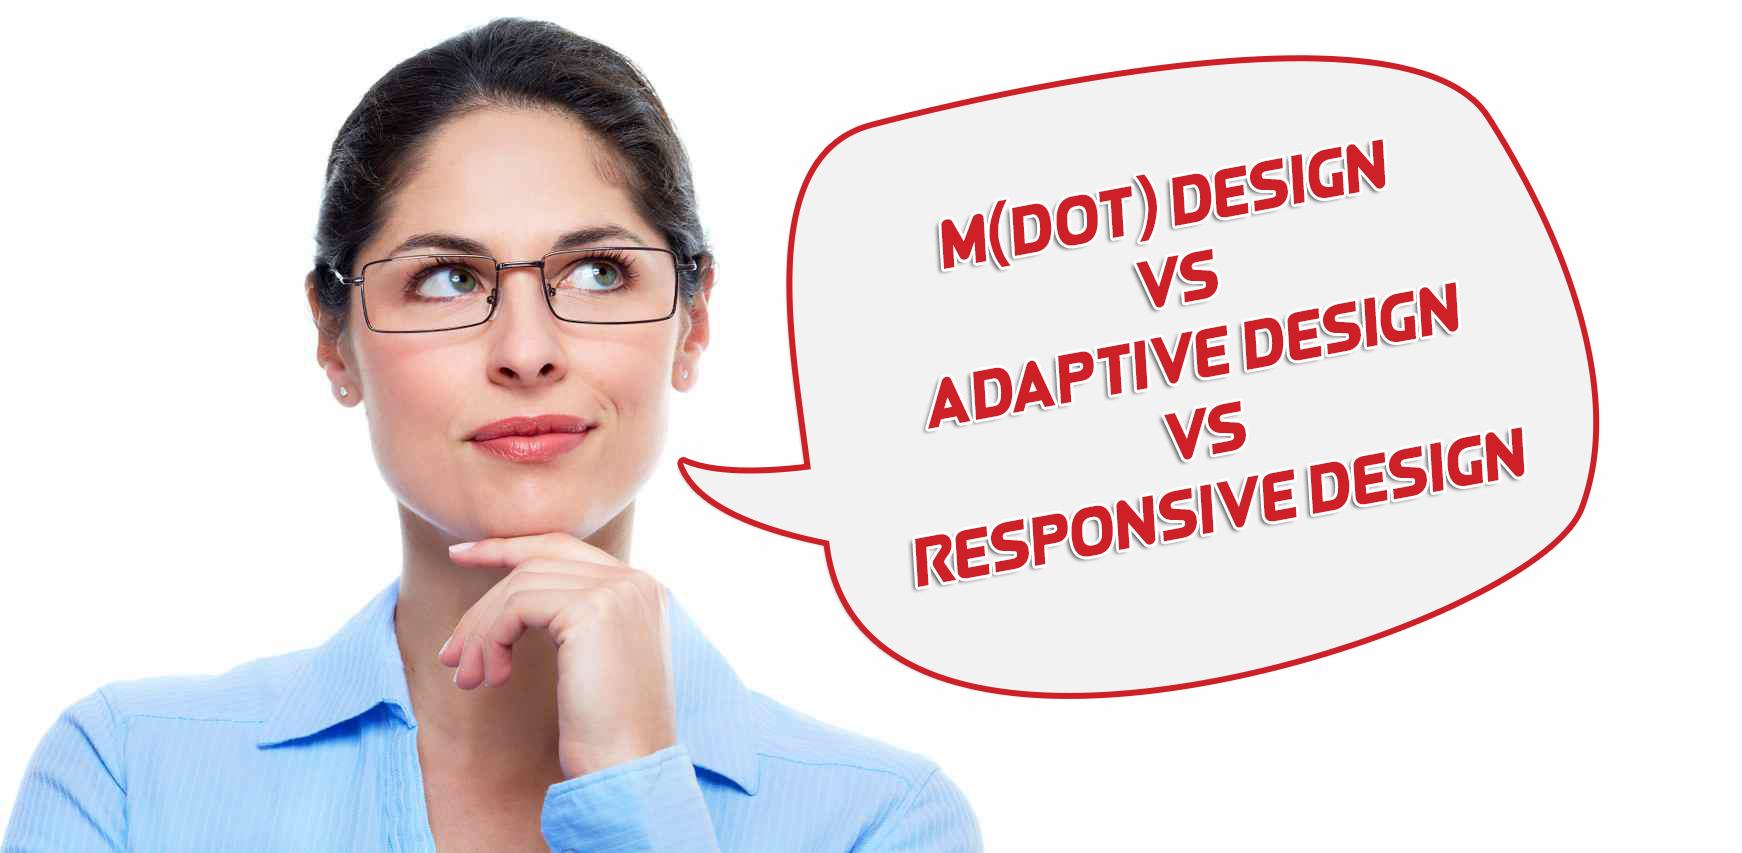 responsive design, adaptive design